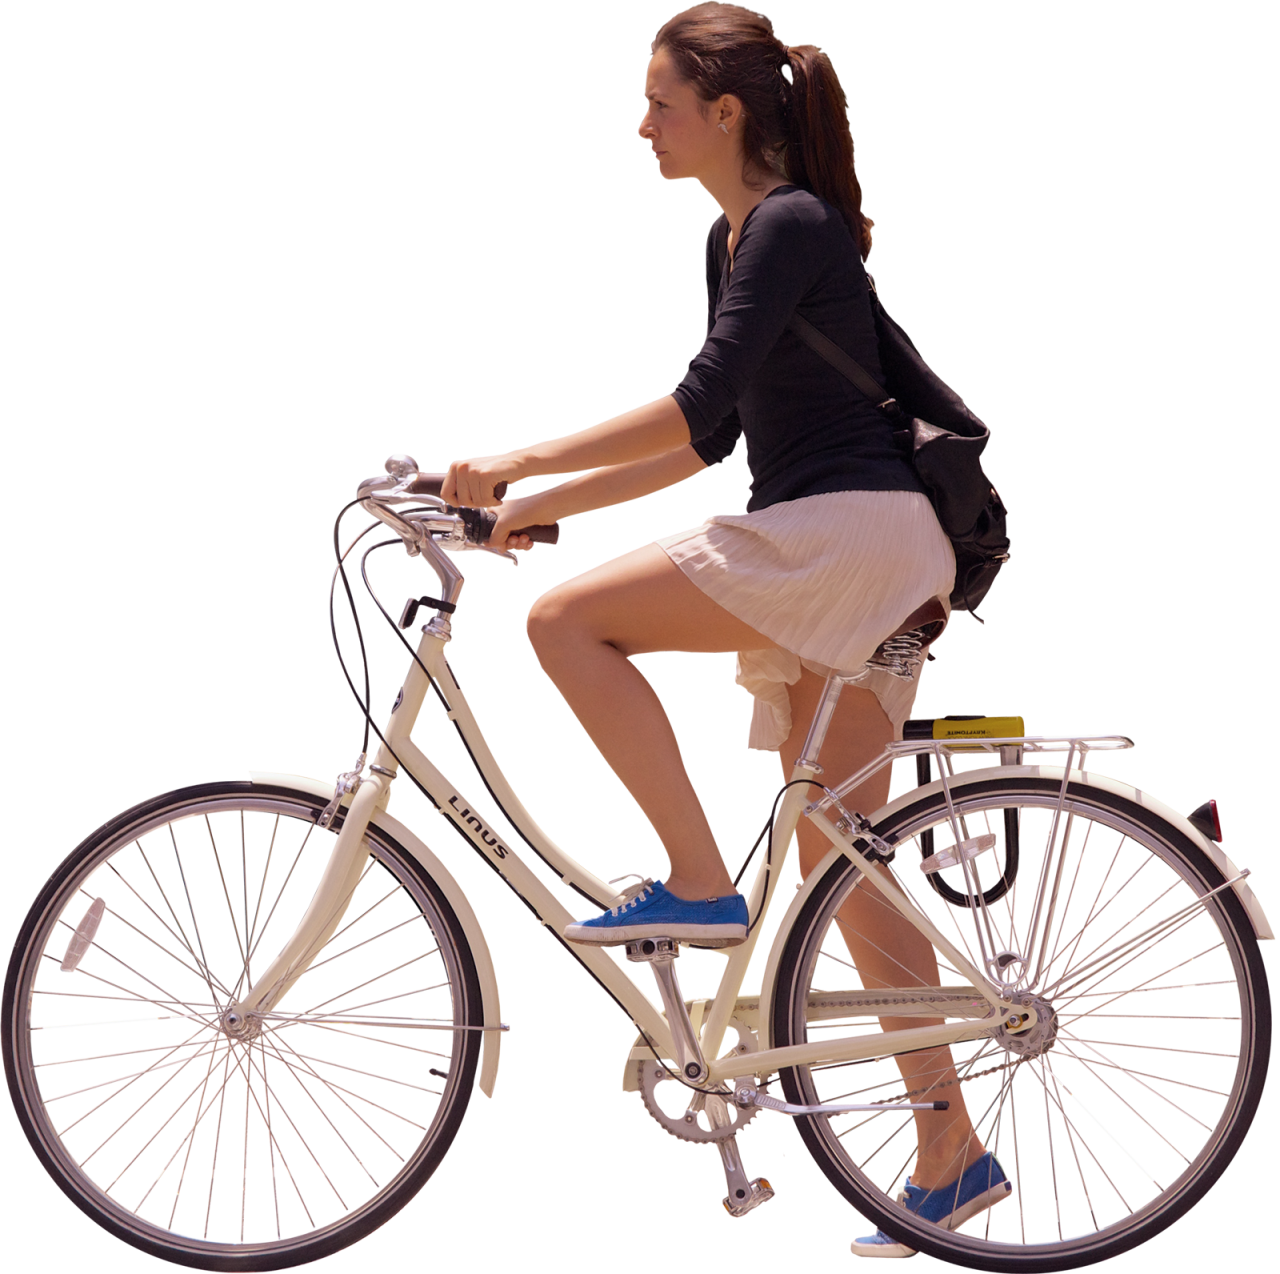 Girl Ride Bicycle PNG Image